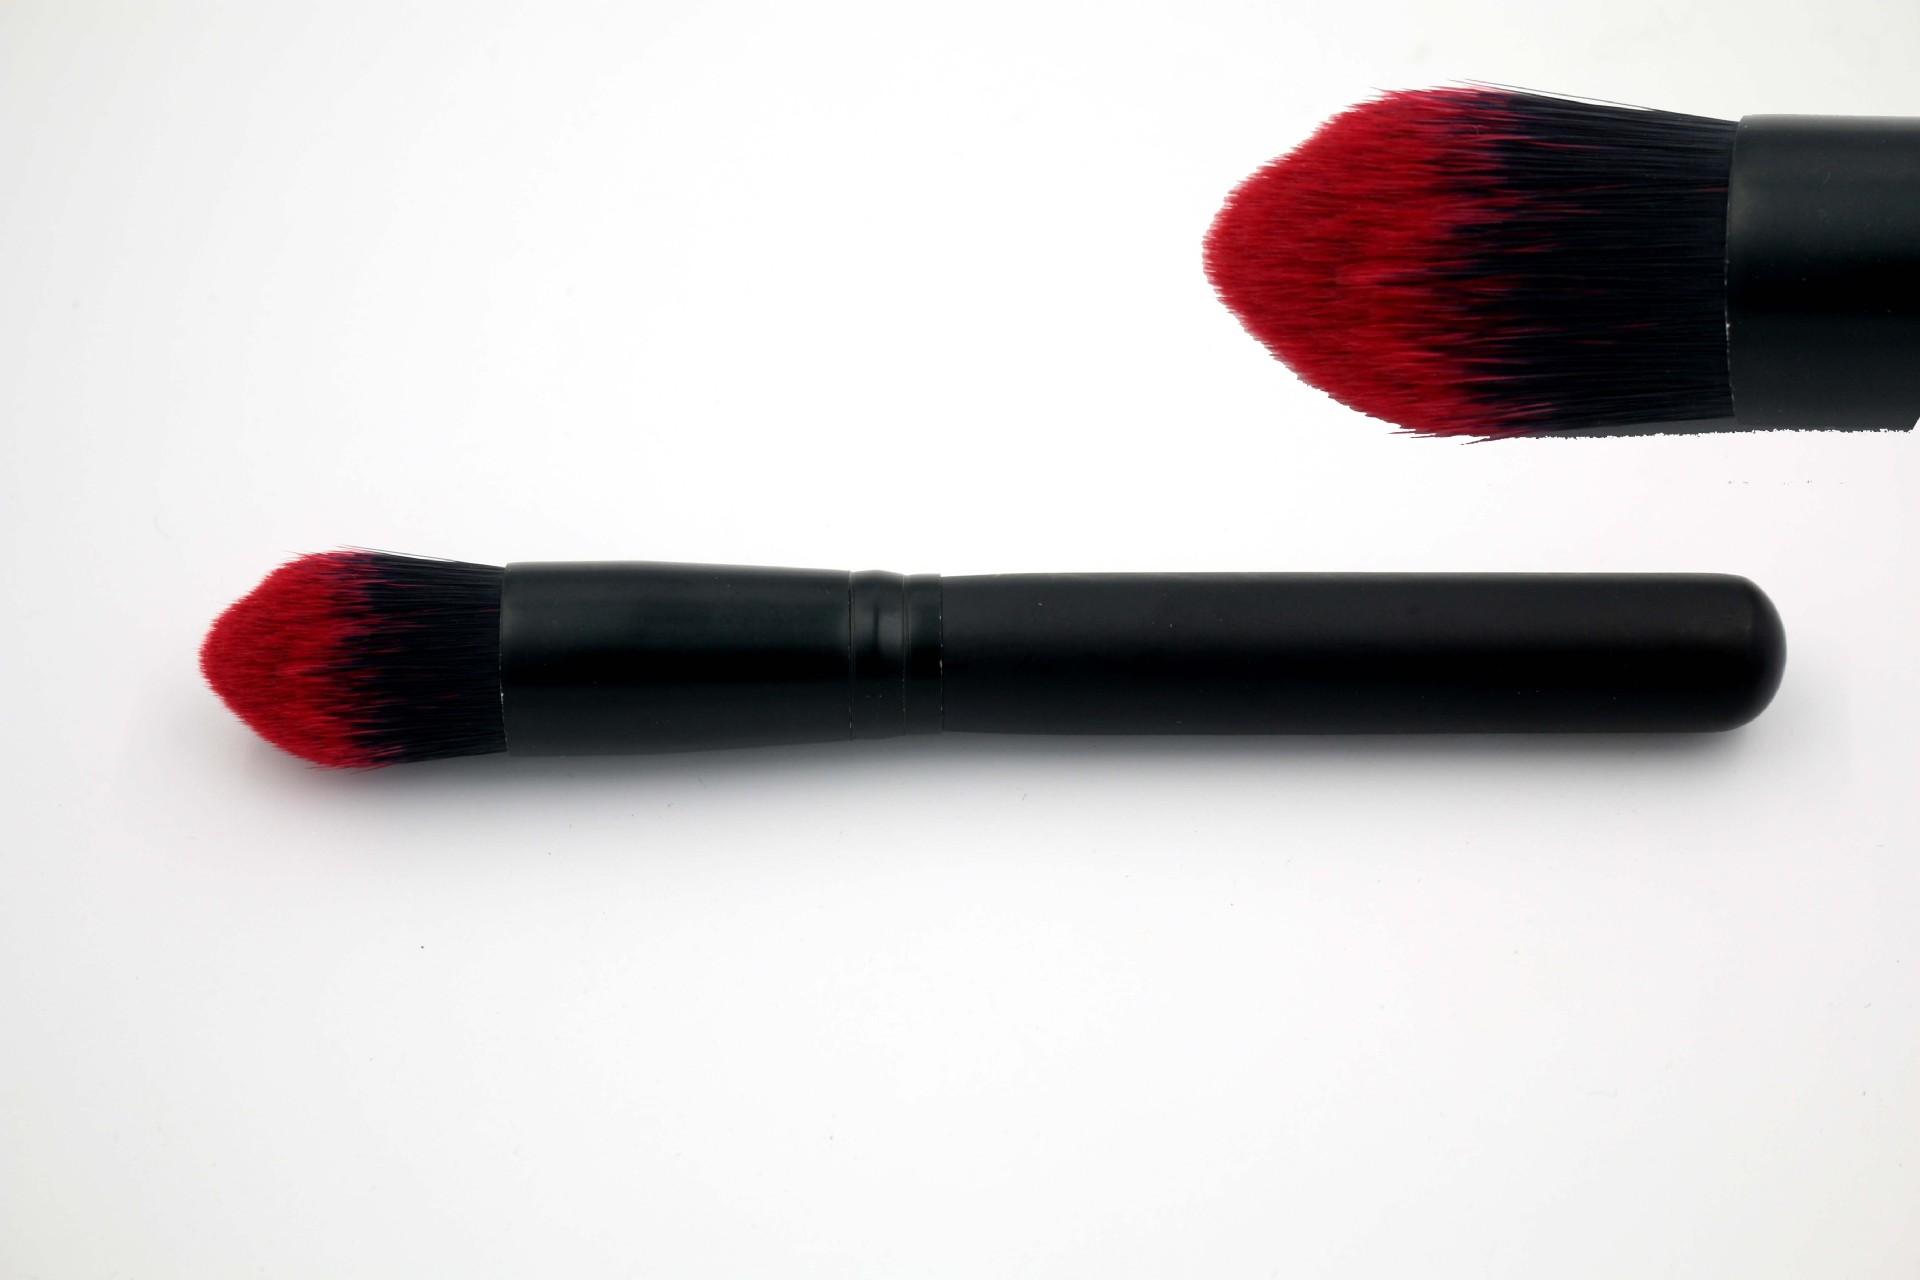 Кисти для макияжа из синтетического волокна